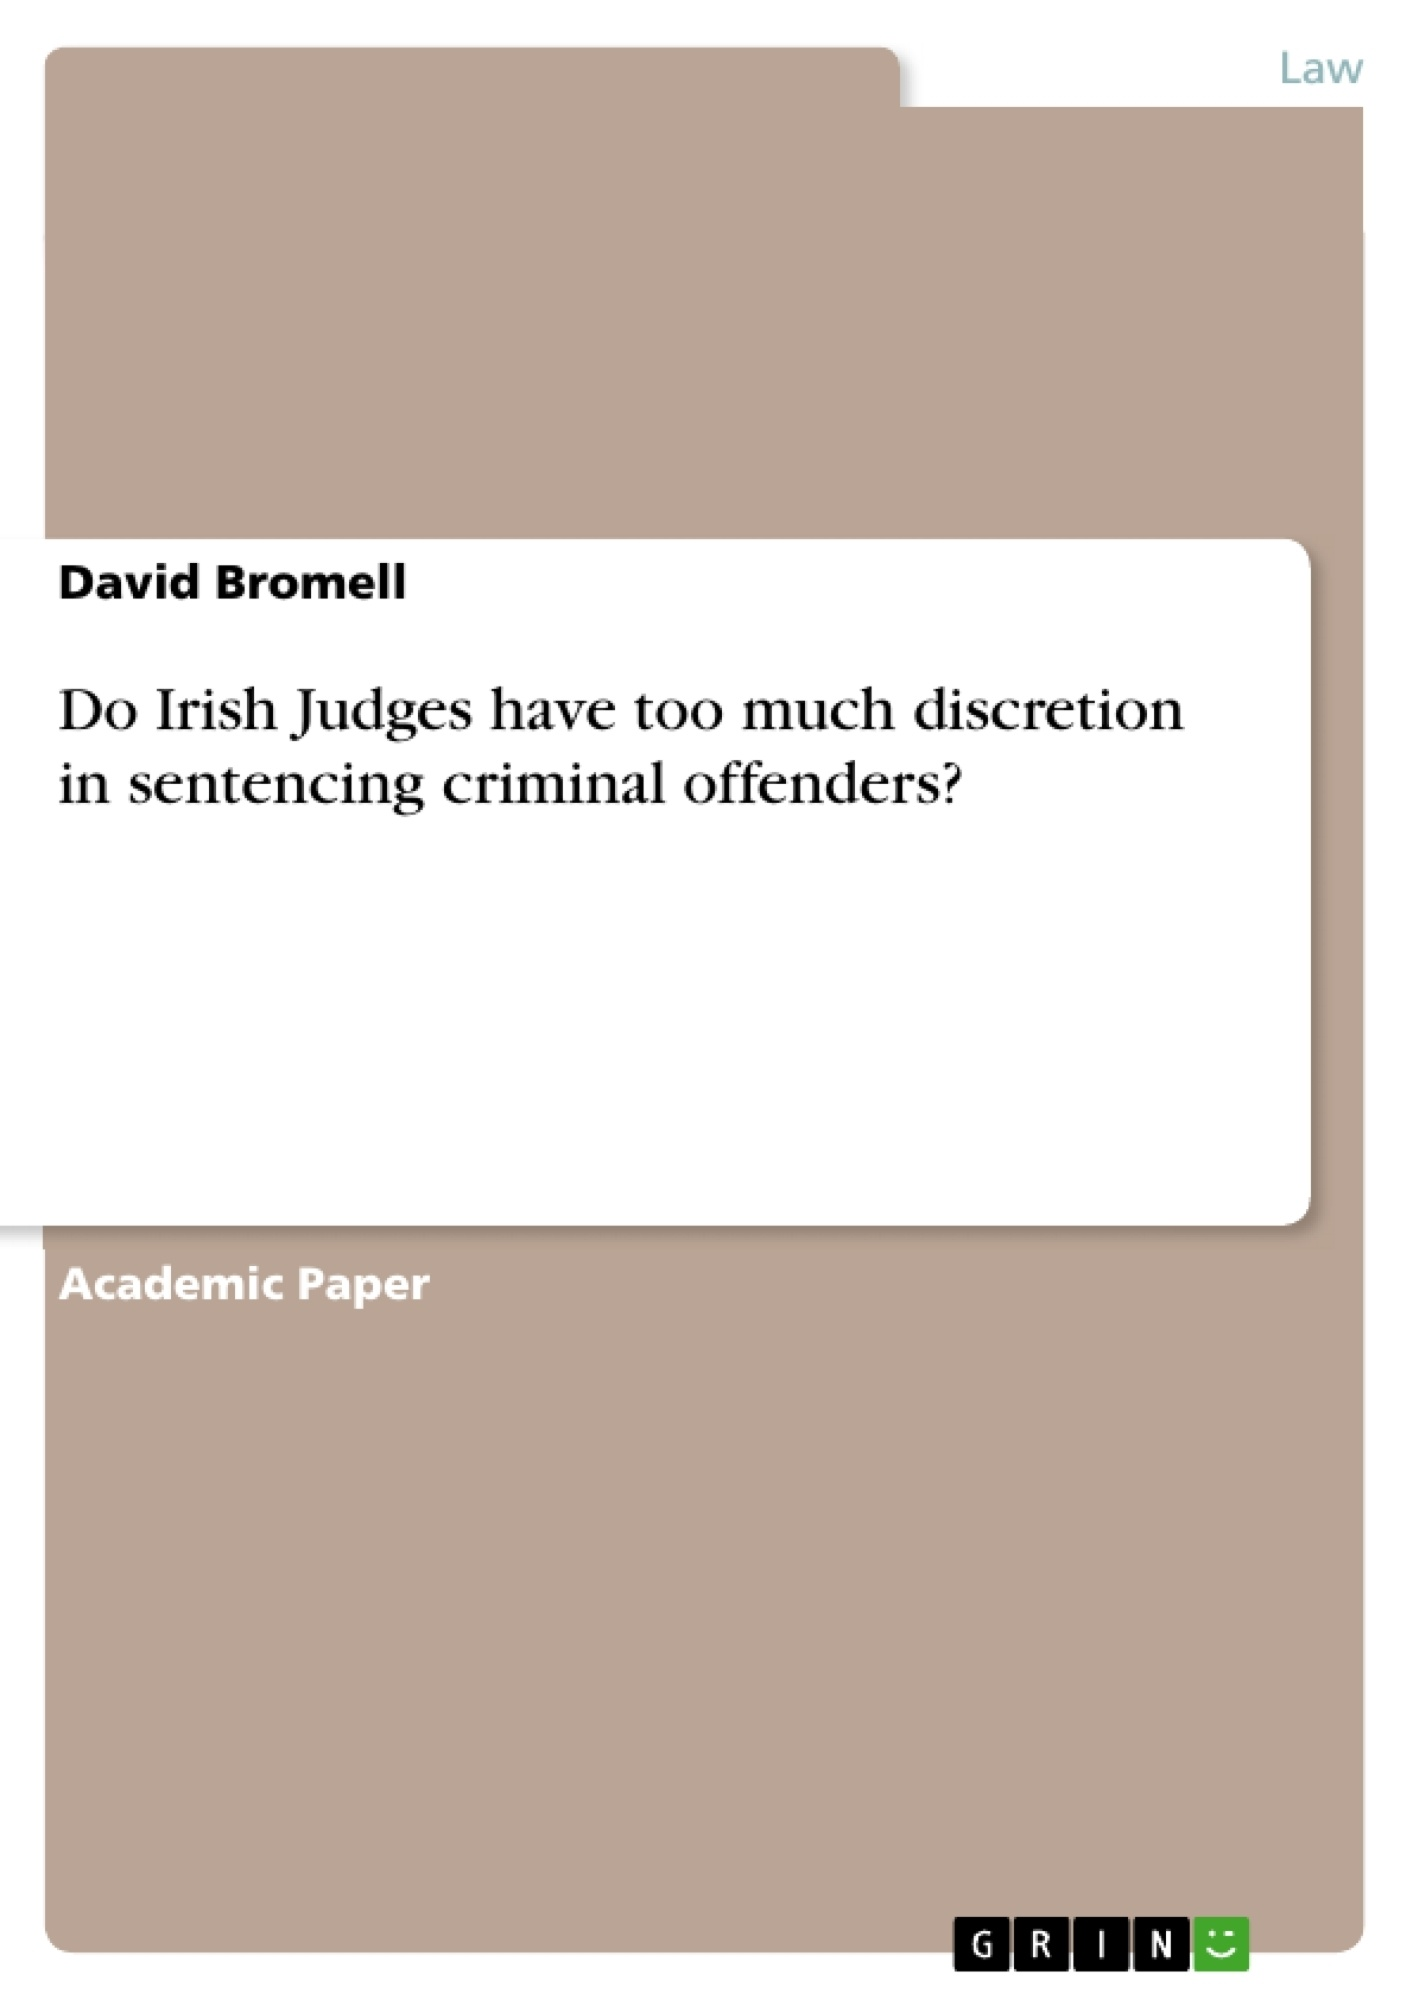 abuse of judicial discretion